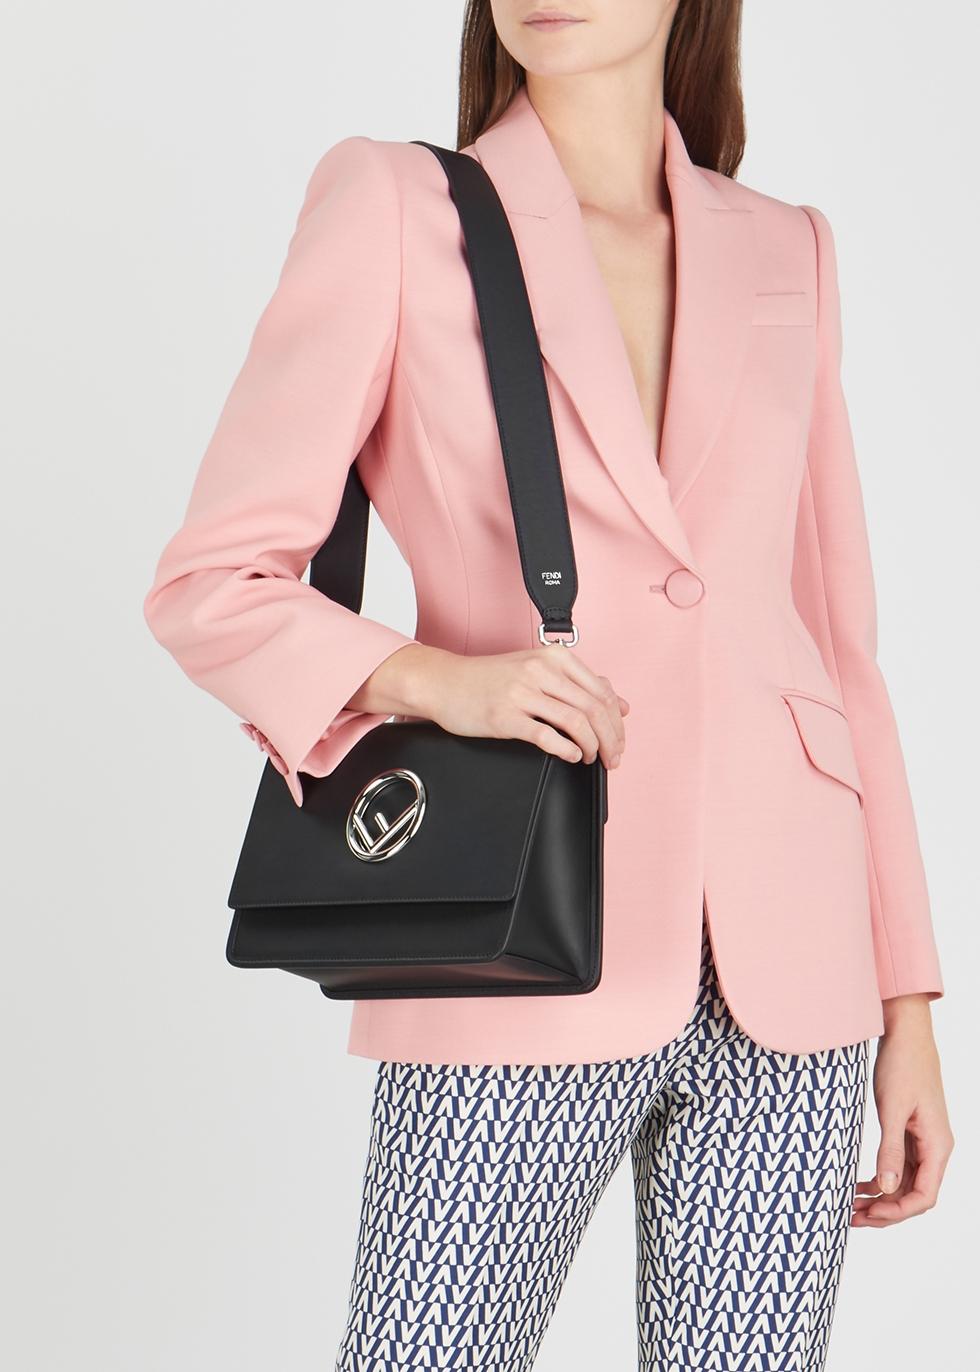 a7eb7036f095 Fendi Kan I F medium leather shoulder bag - Harvey Nichols